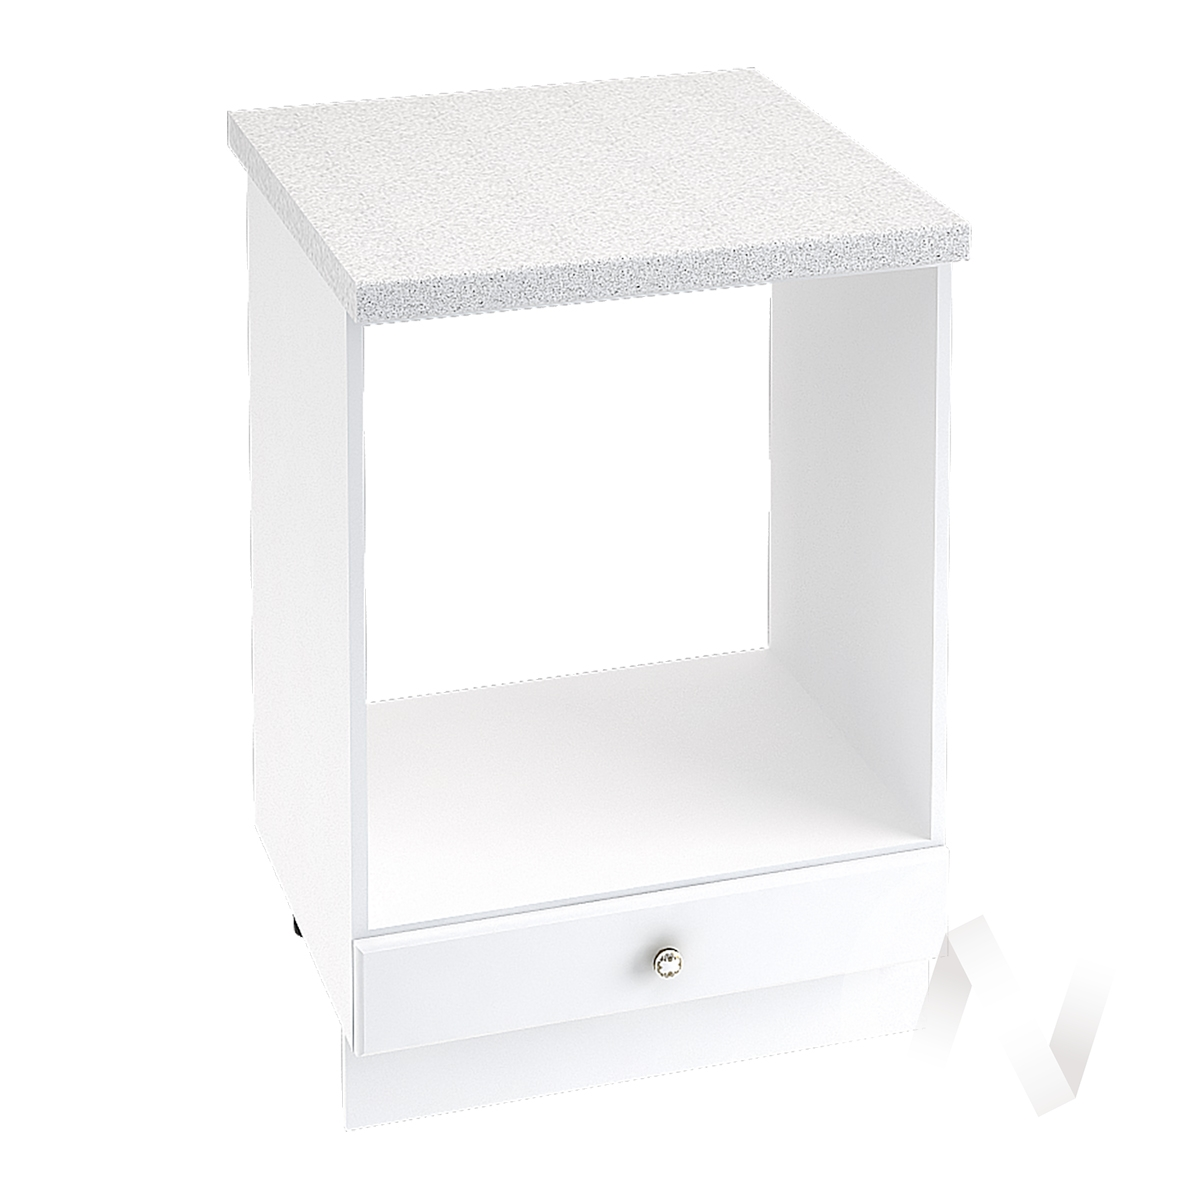 "Кухня ""Шарлиз"": Шкаф нижний под духовку 600, ШНД 600 (корпус белый)"